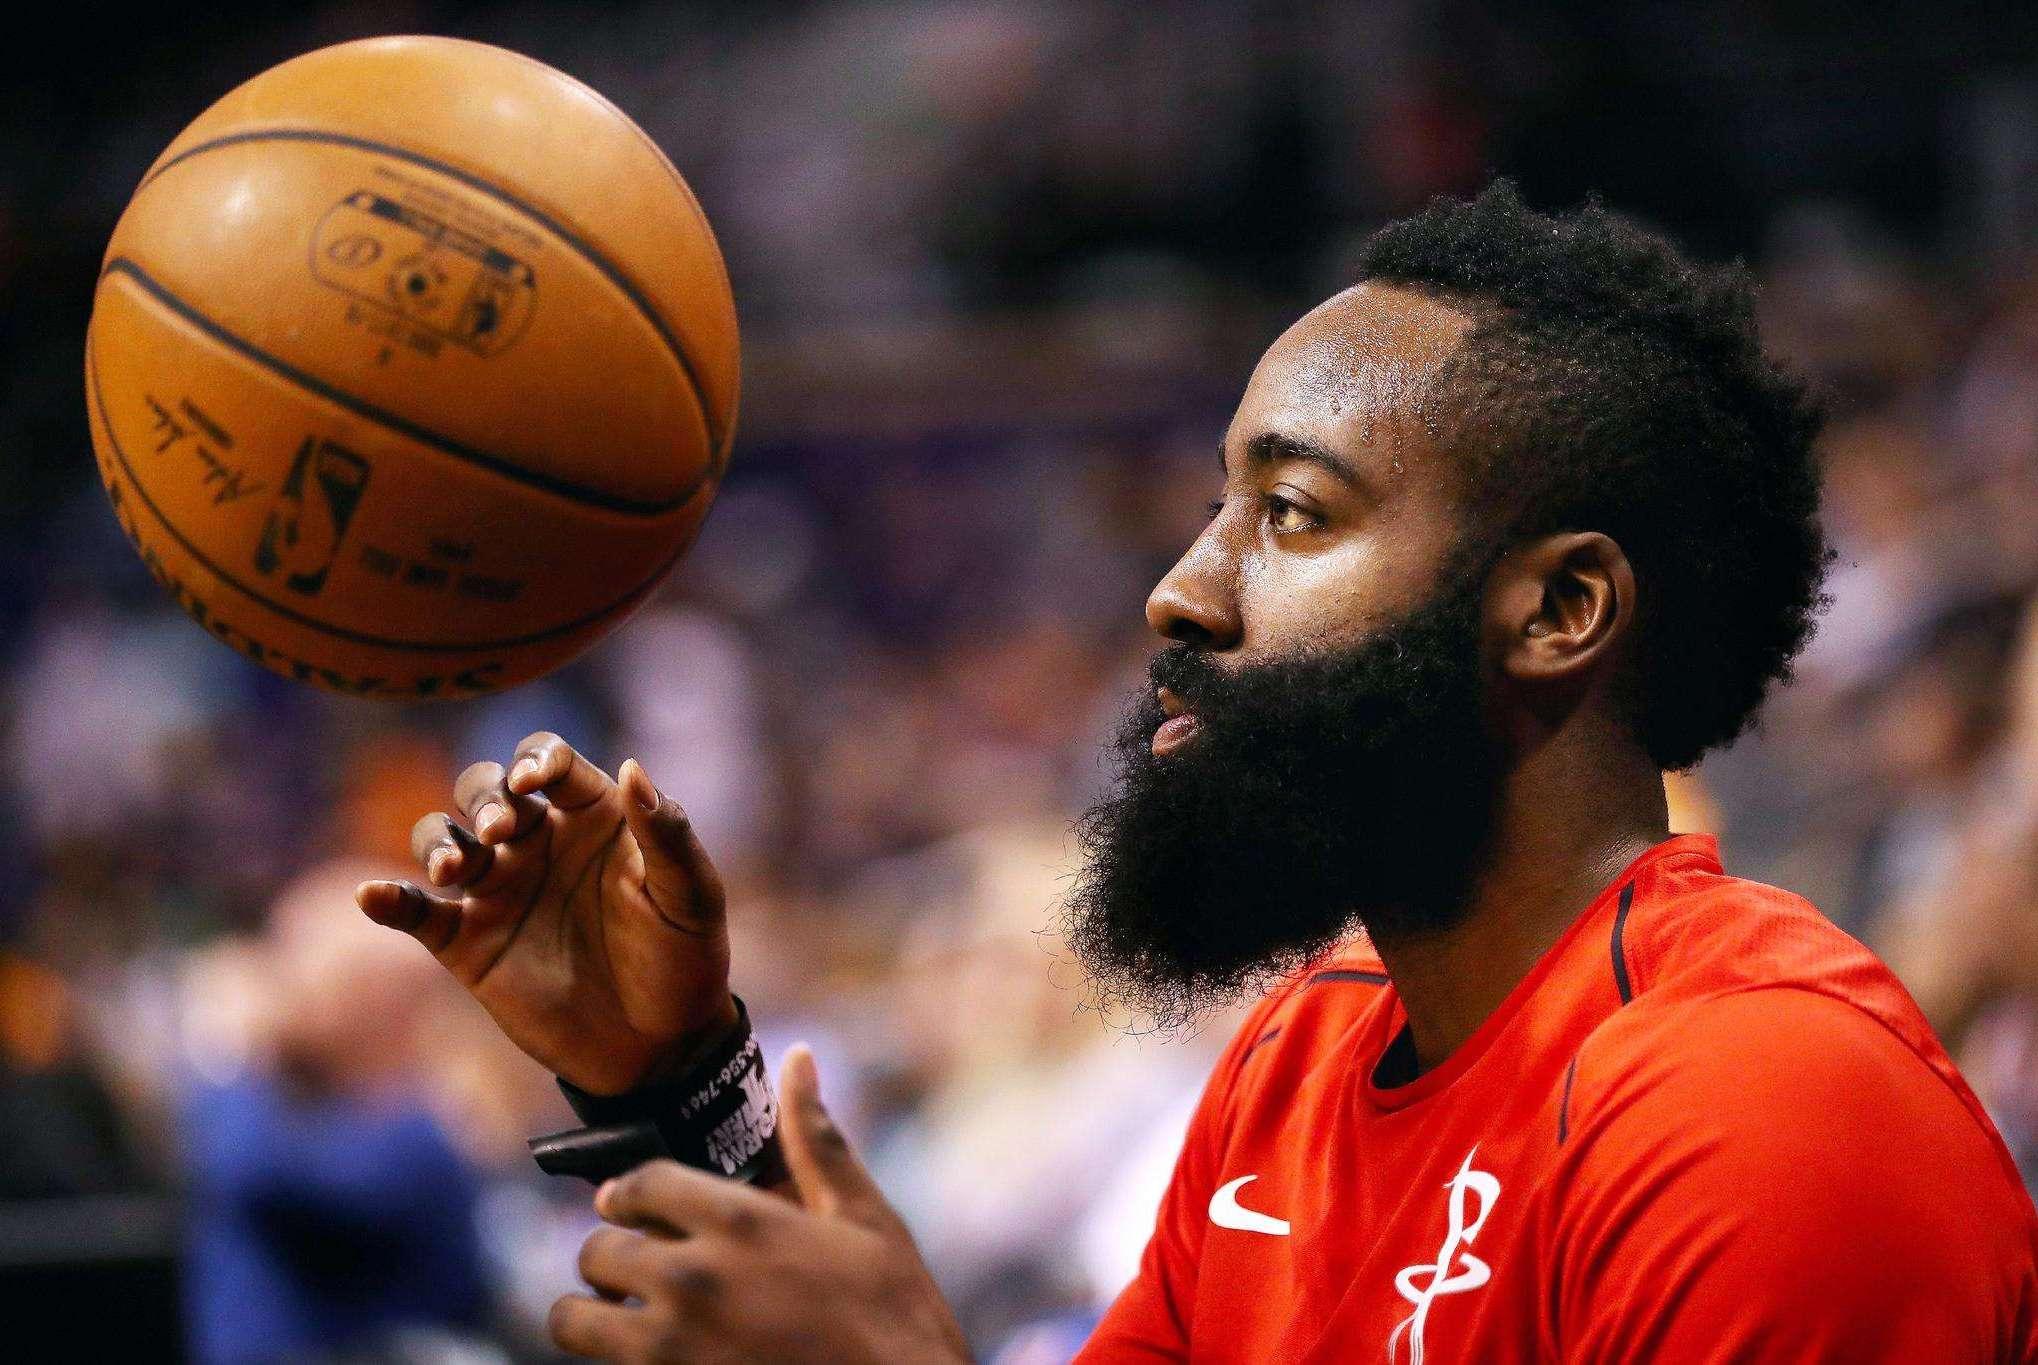 NBA连续罚球场次排名:哈登第8,奥尼尔第4,霍华德第2,谁第1?